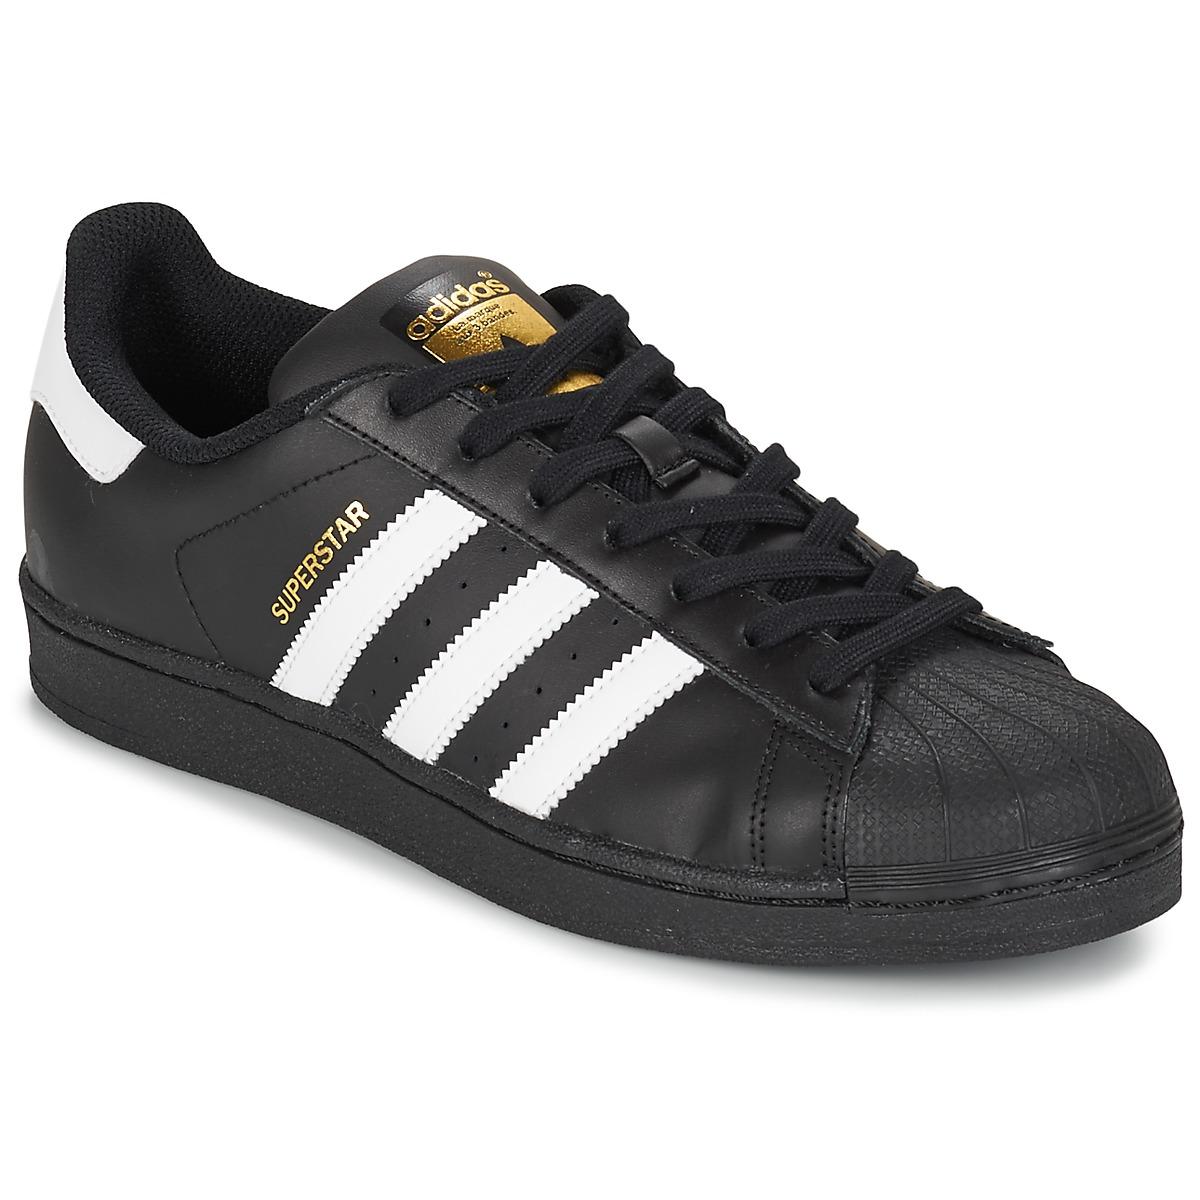 superstar adidas nere e bianche. adidas superstar all black adidas superstar taglia 35